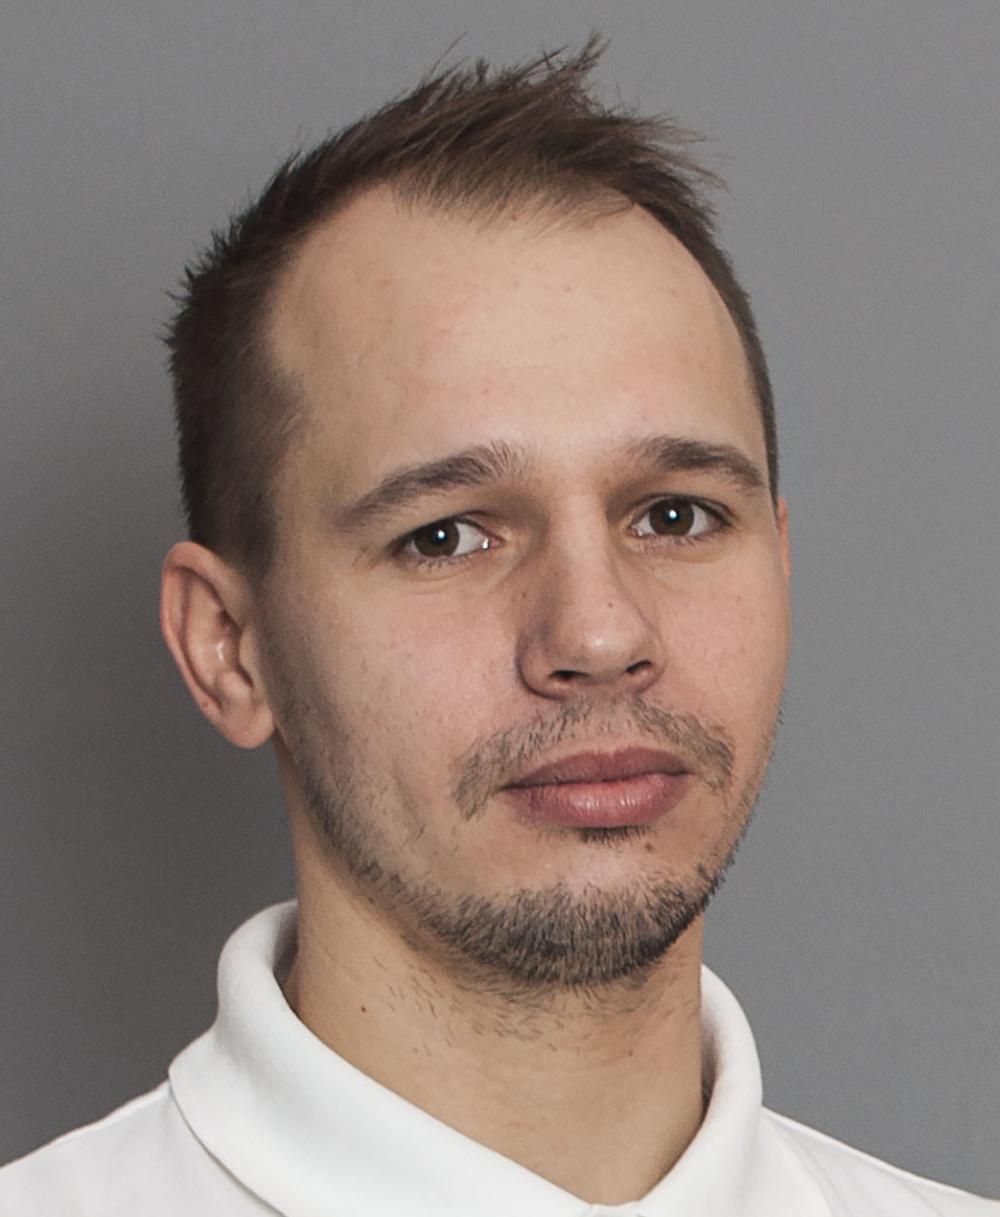 Mariusz Demeszuk